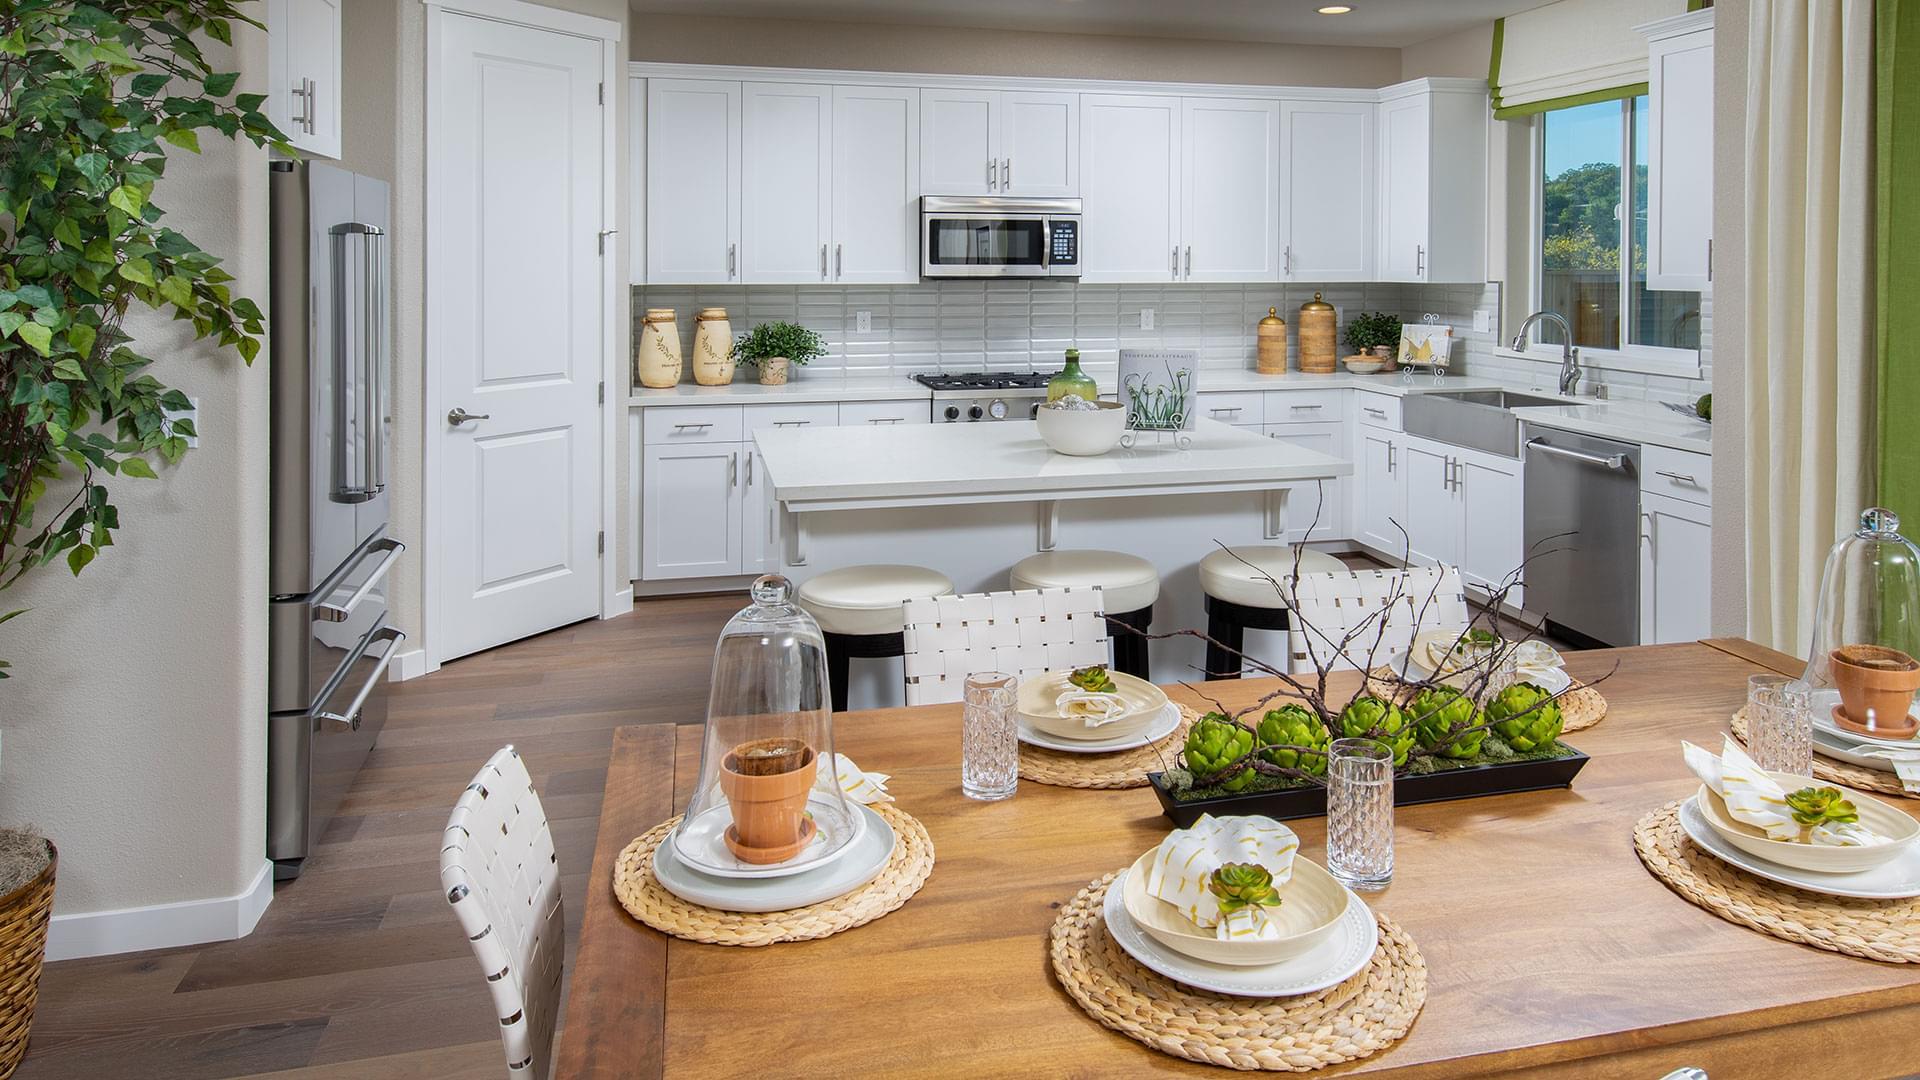 Residence 2 Kitchen & Dining